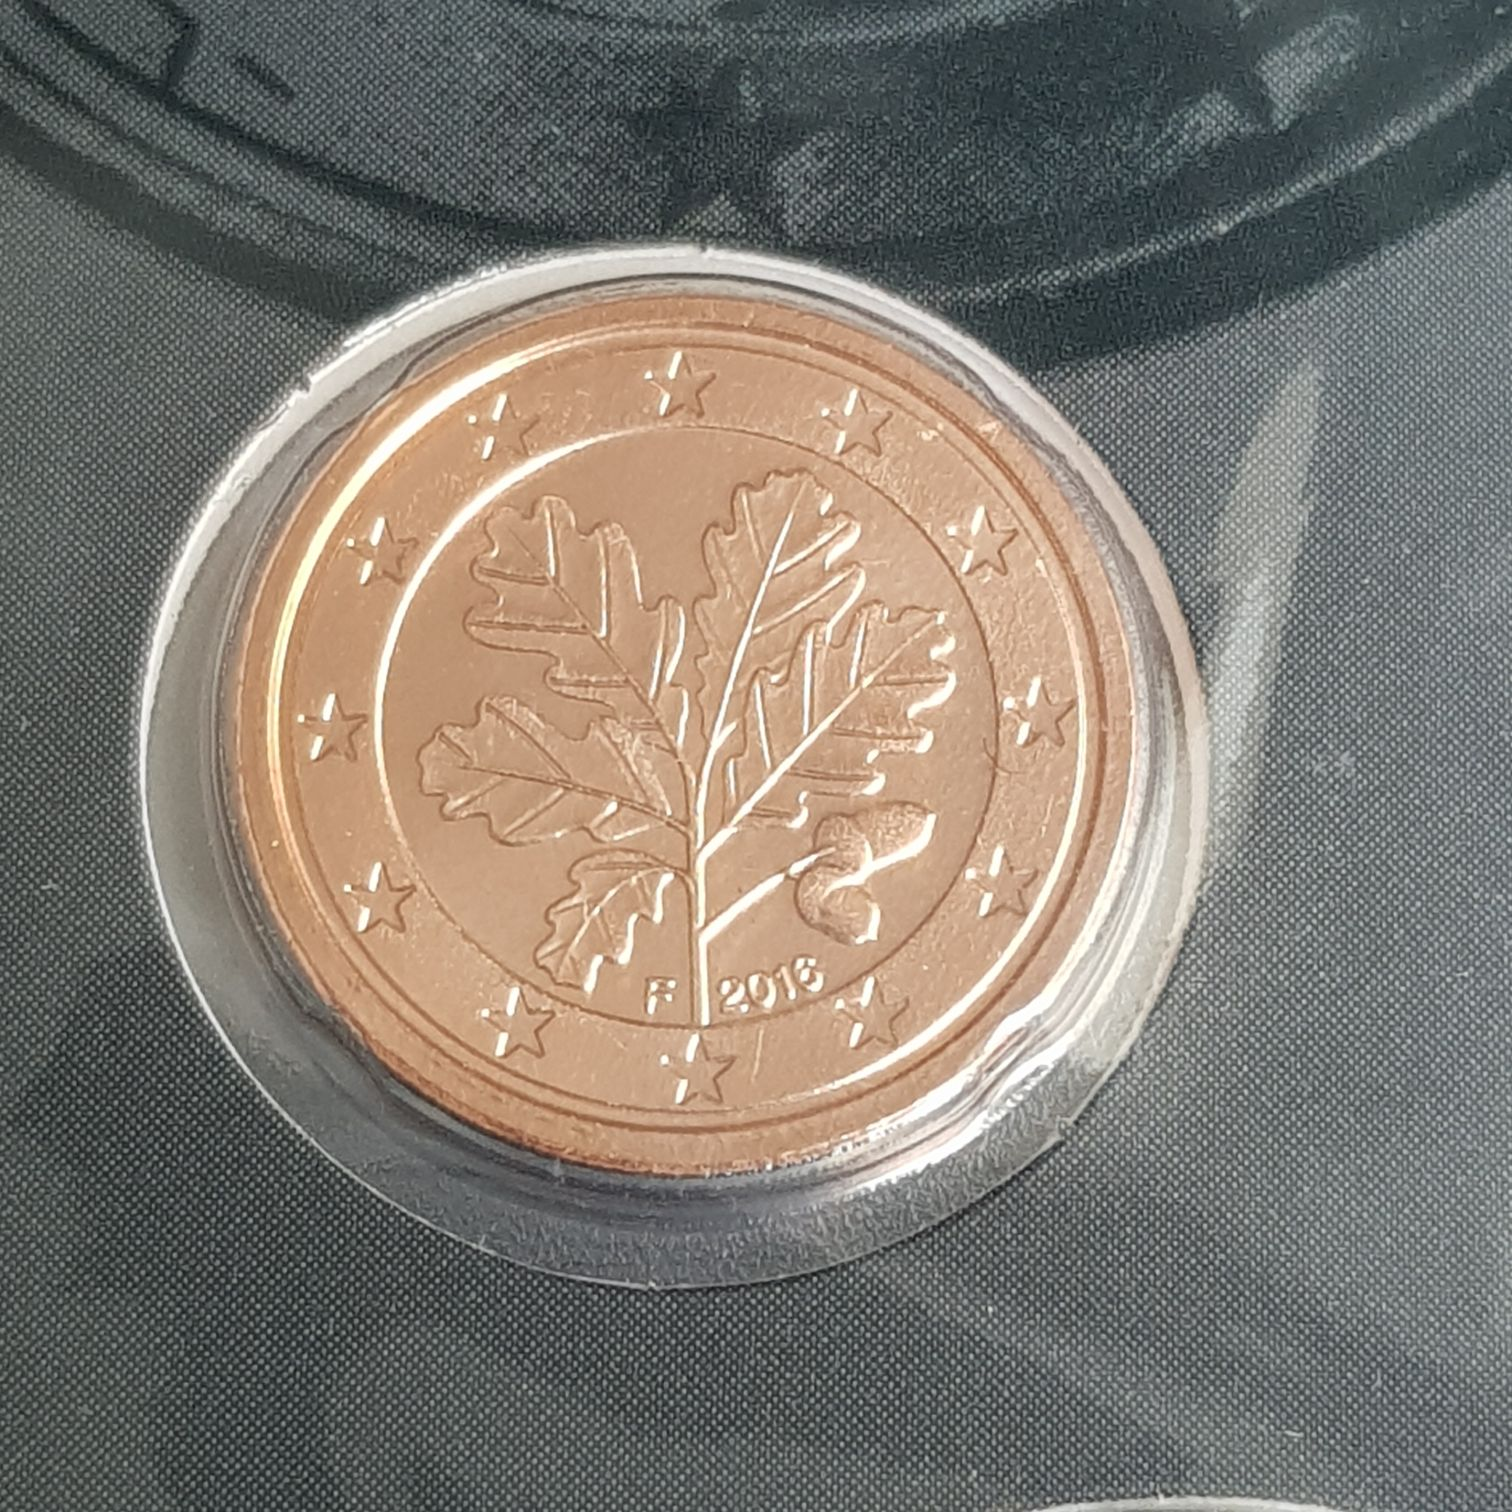 .01 Centavo De Euro Coin - $.01 (2016) back image (back cover, second image)